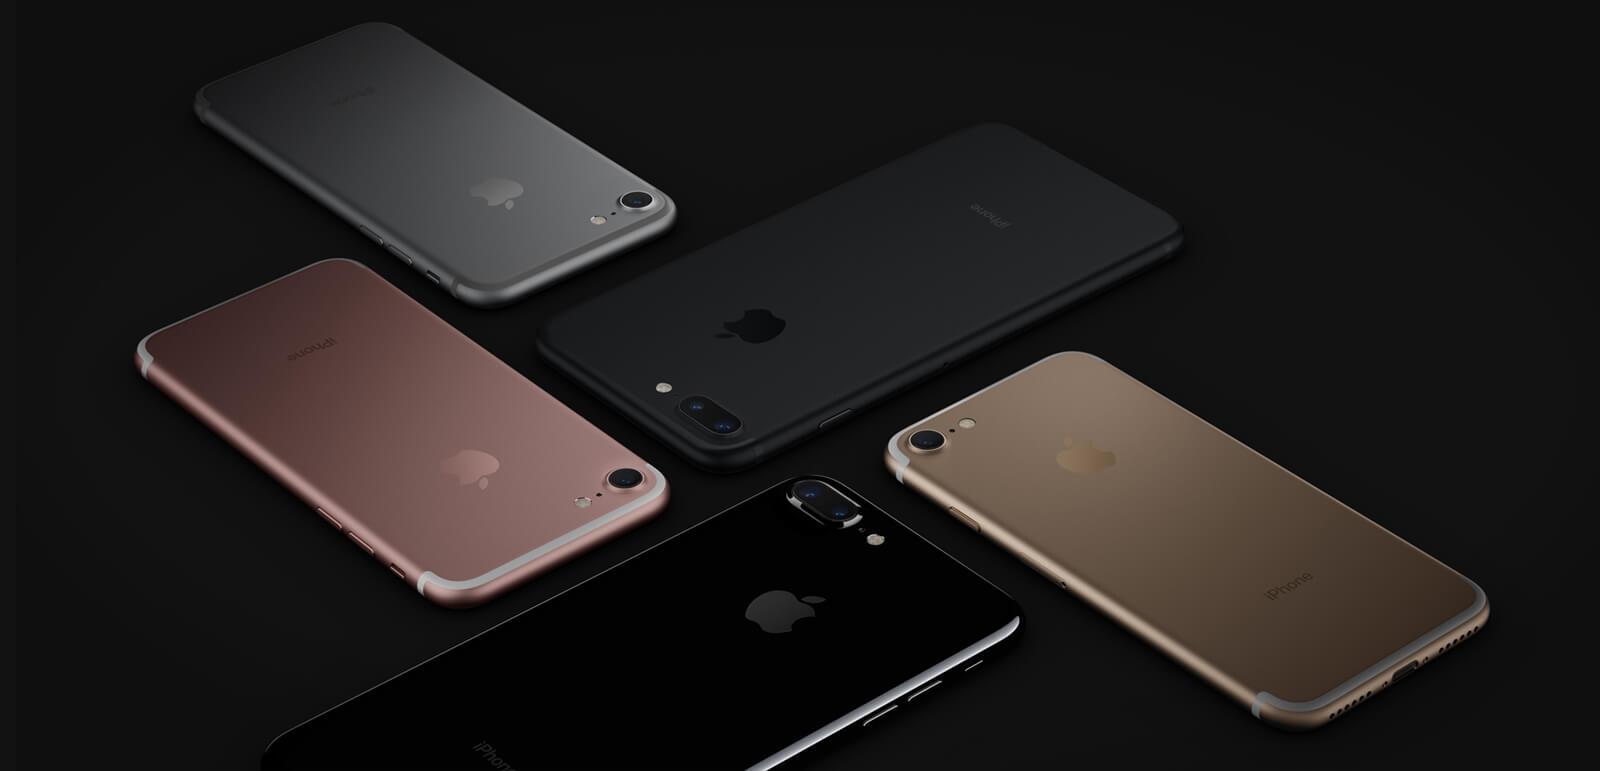 Différentes coloris iPhone 7